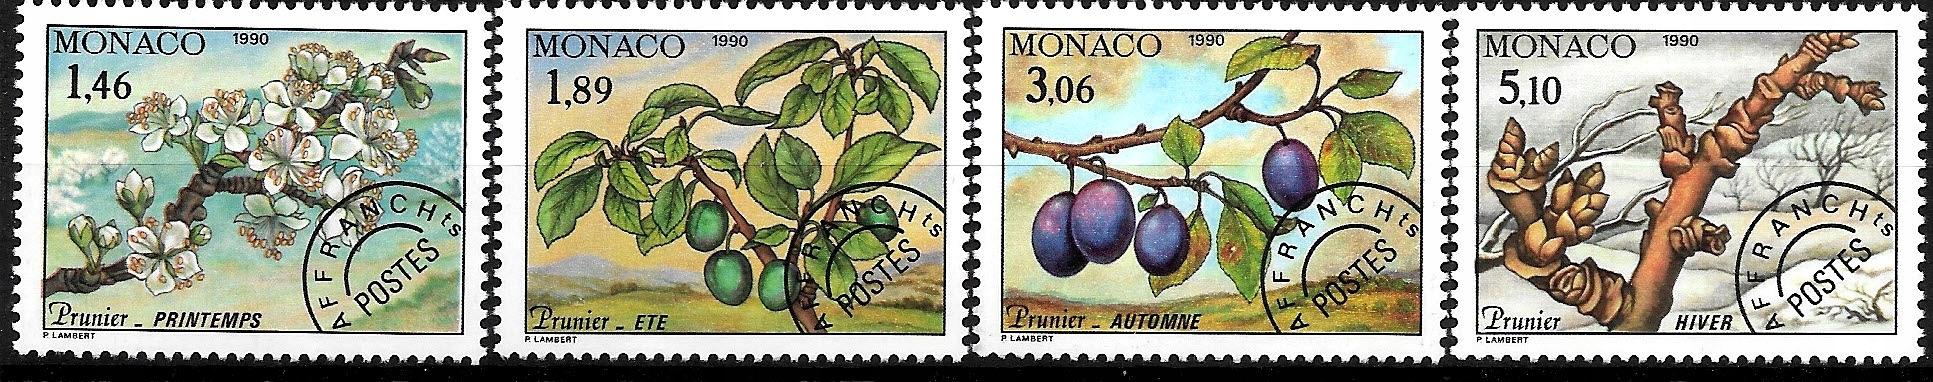 FL907 1990 FLORA drzewa, owoce zn.** Monako